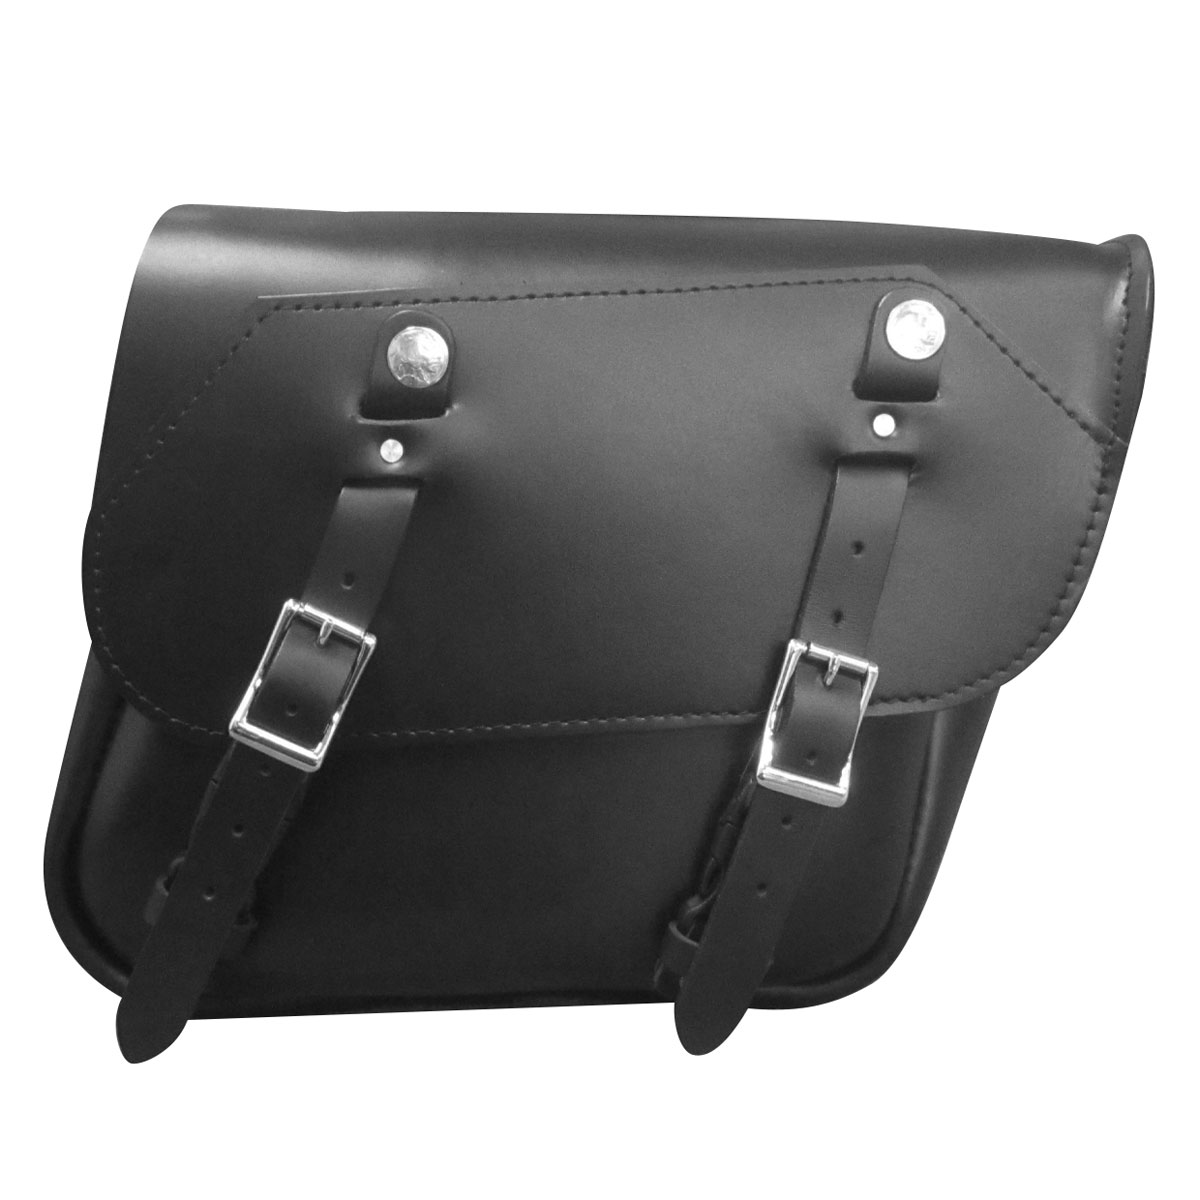 Leatherworks, Inc. Retro Saddlebags